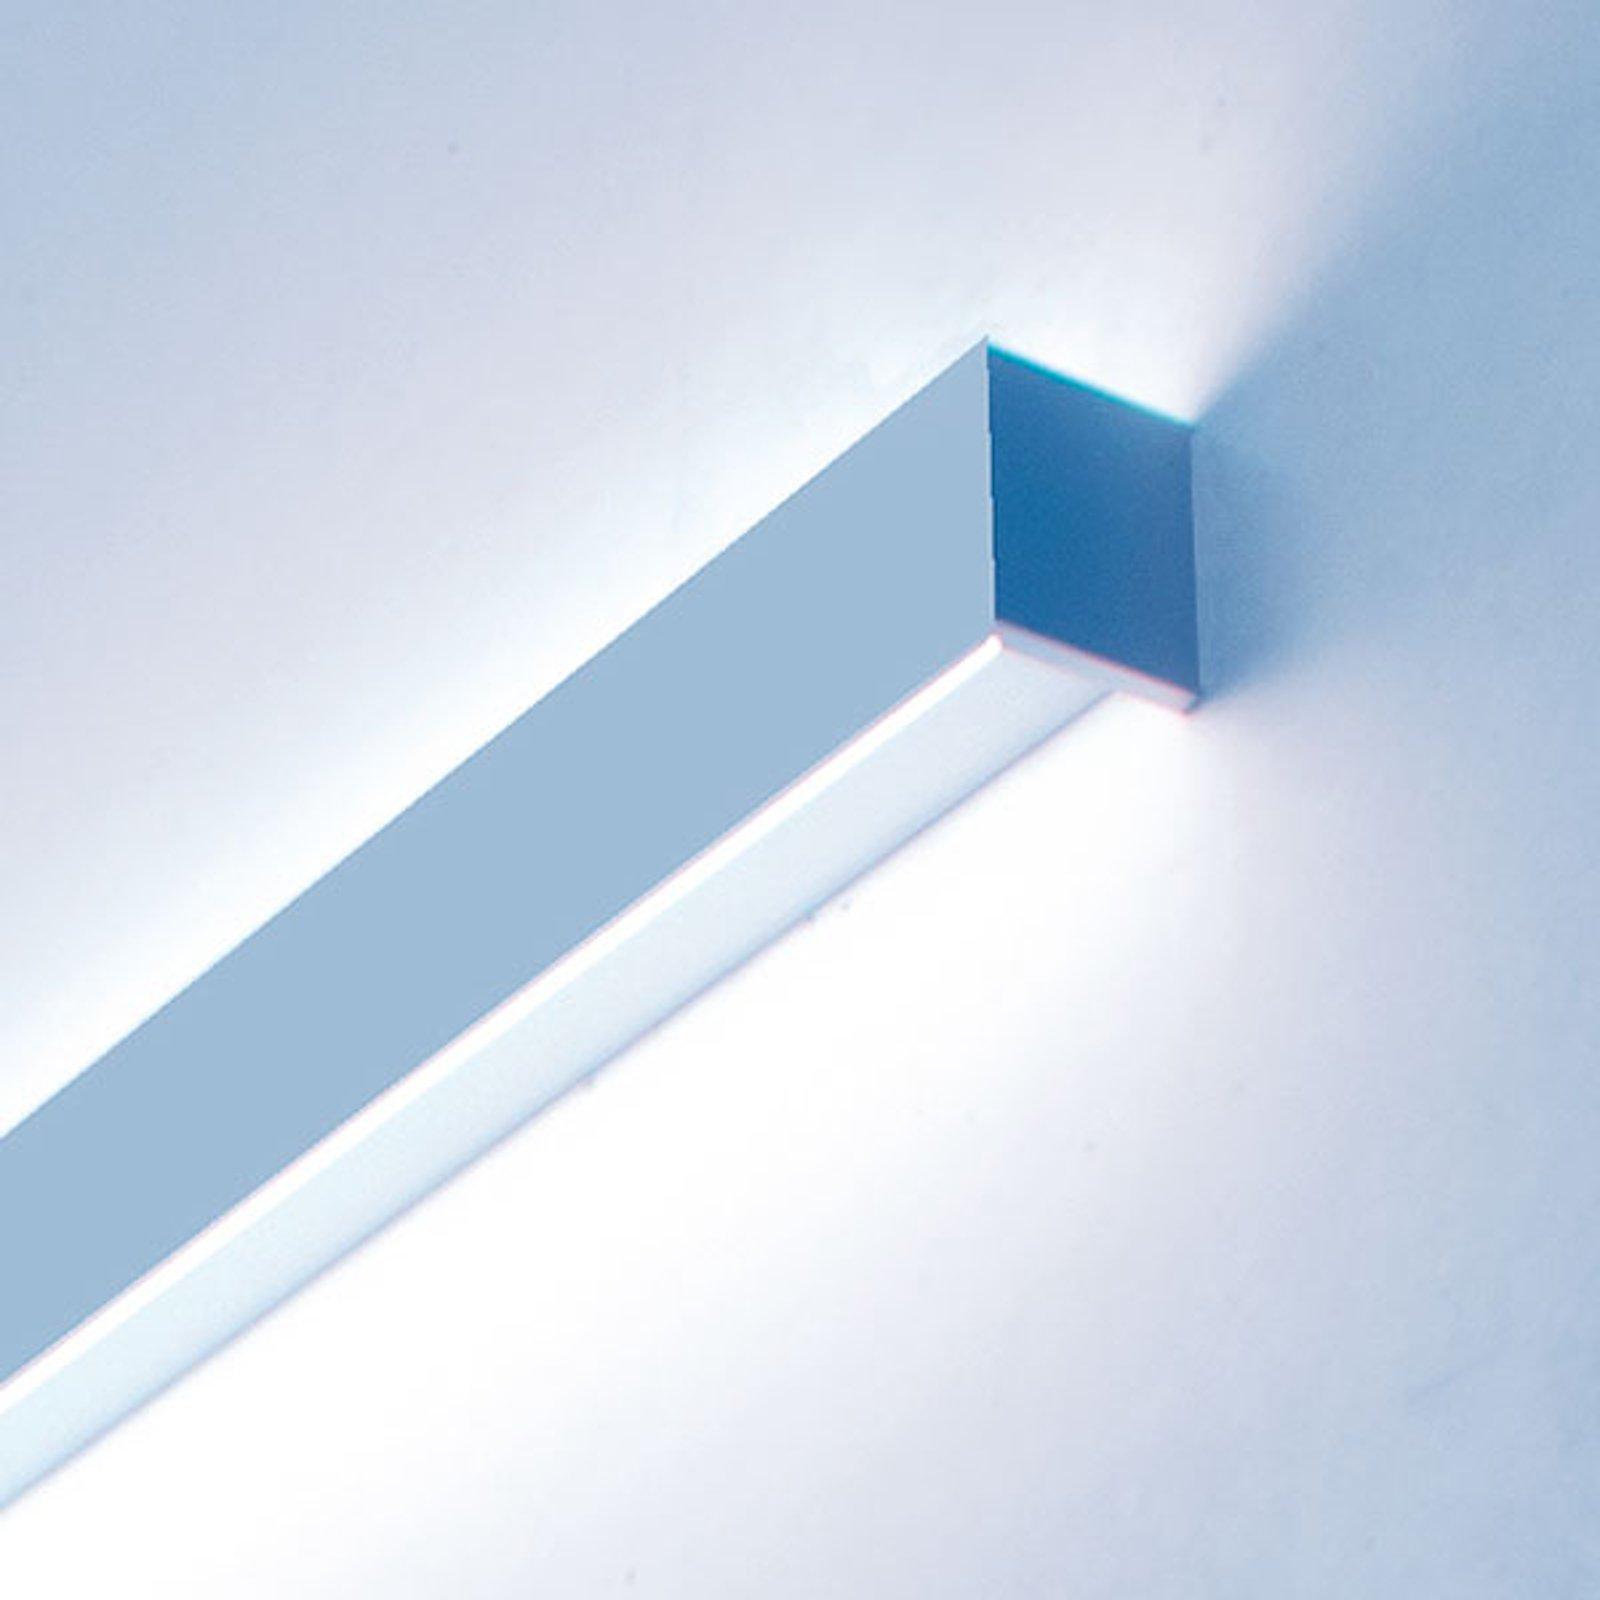 Matric W1 LED-vegglampe i 293 cm, 4 000 K